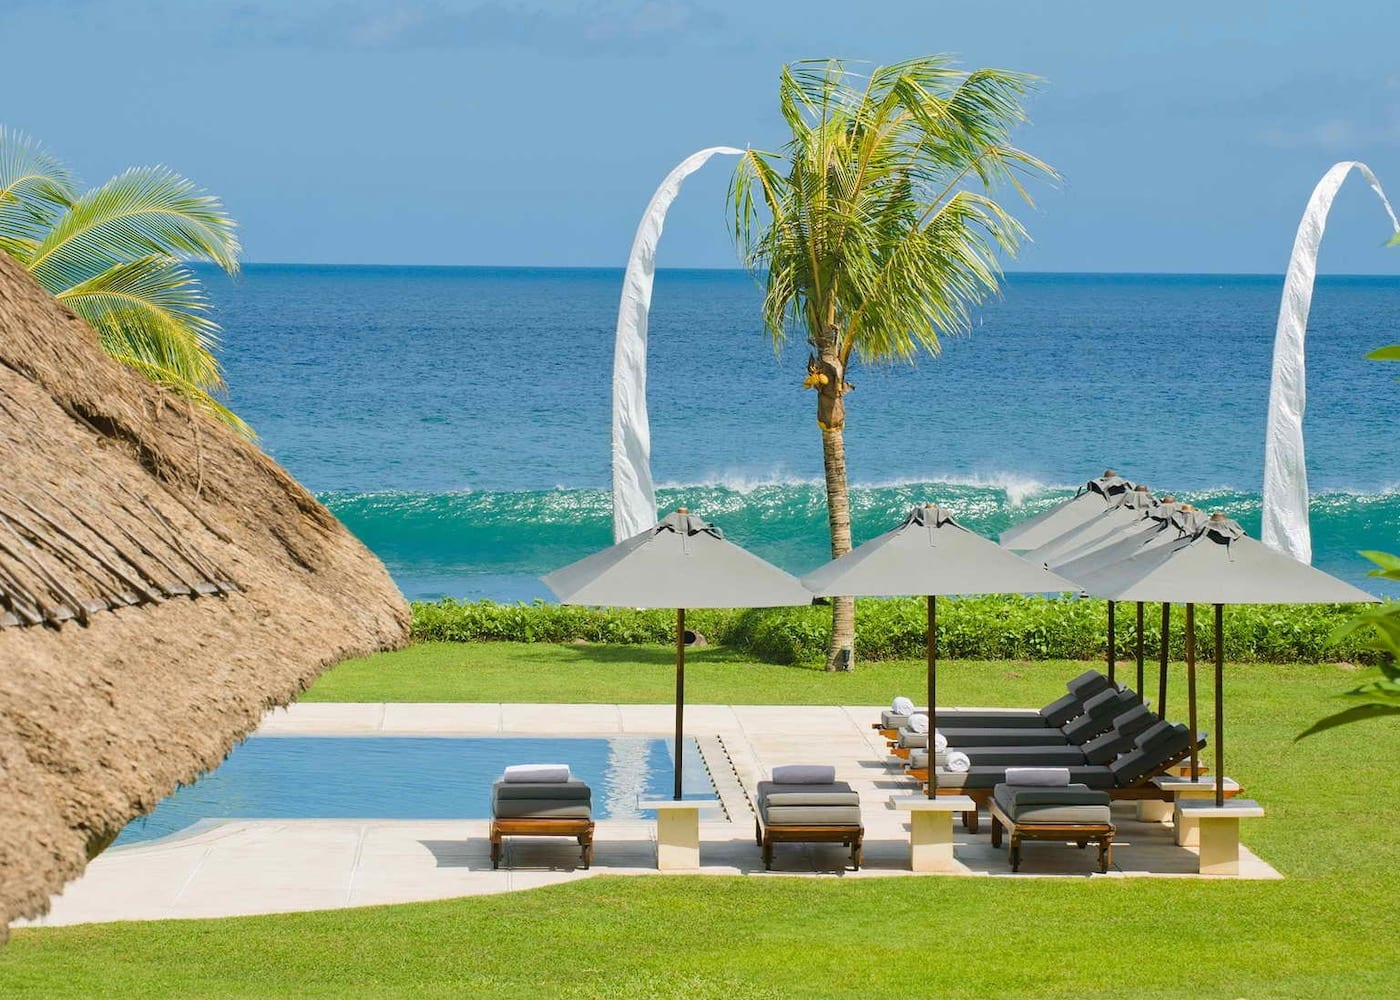 Inside Villa Atas Ombak - one of the best private villas in Seminyak, Bali, Indonesia